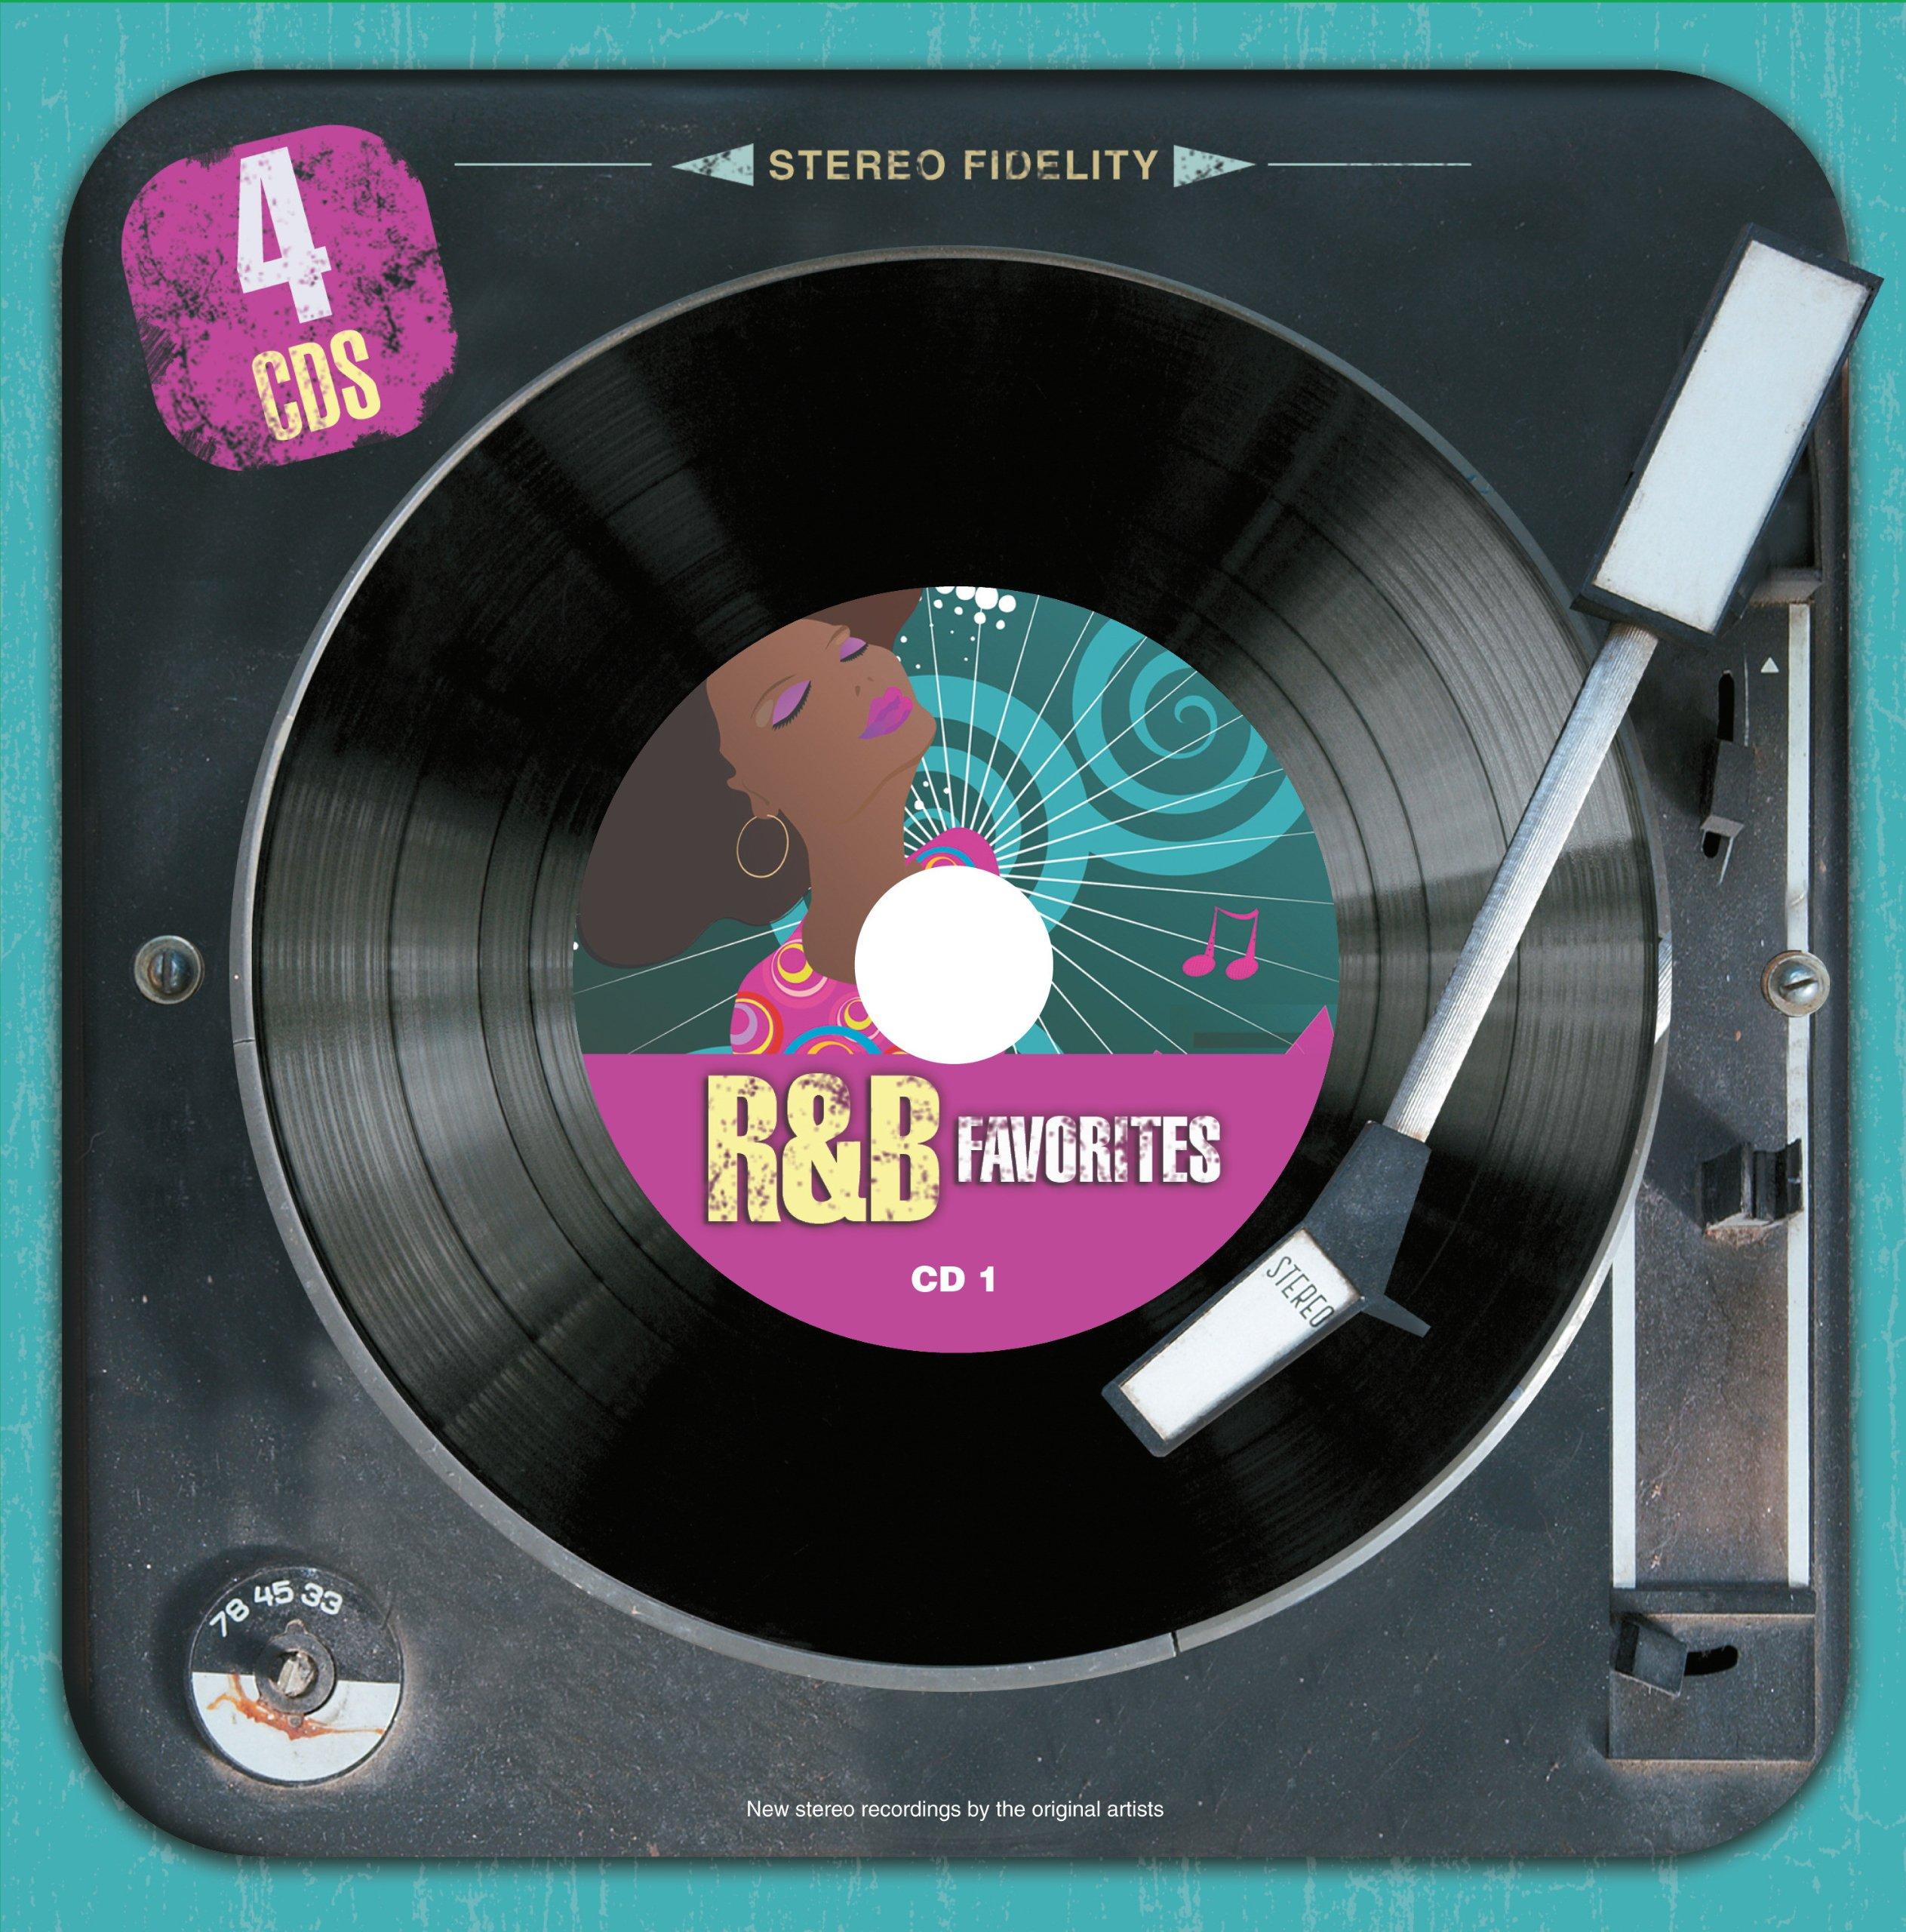 R & B Favorites (Limited Edition 4 CD Set)